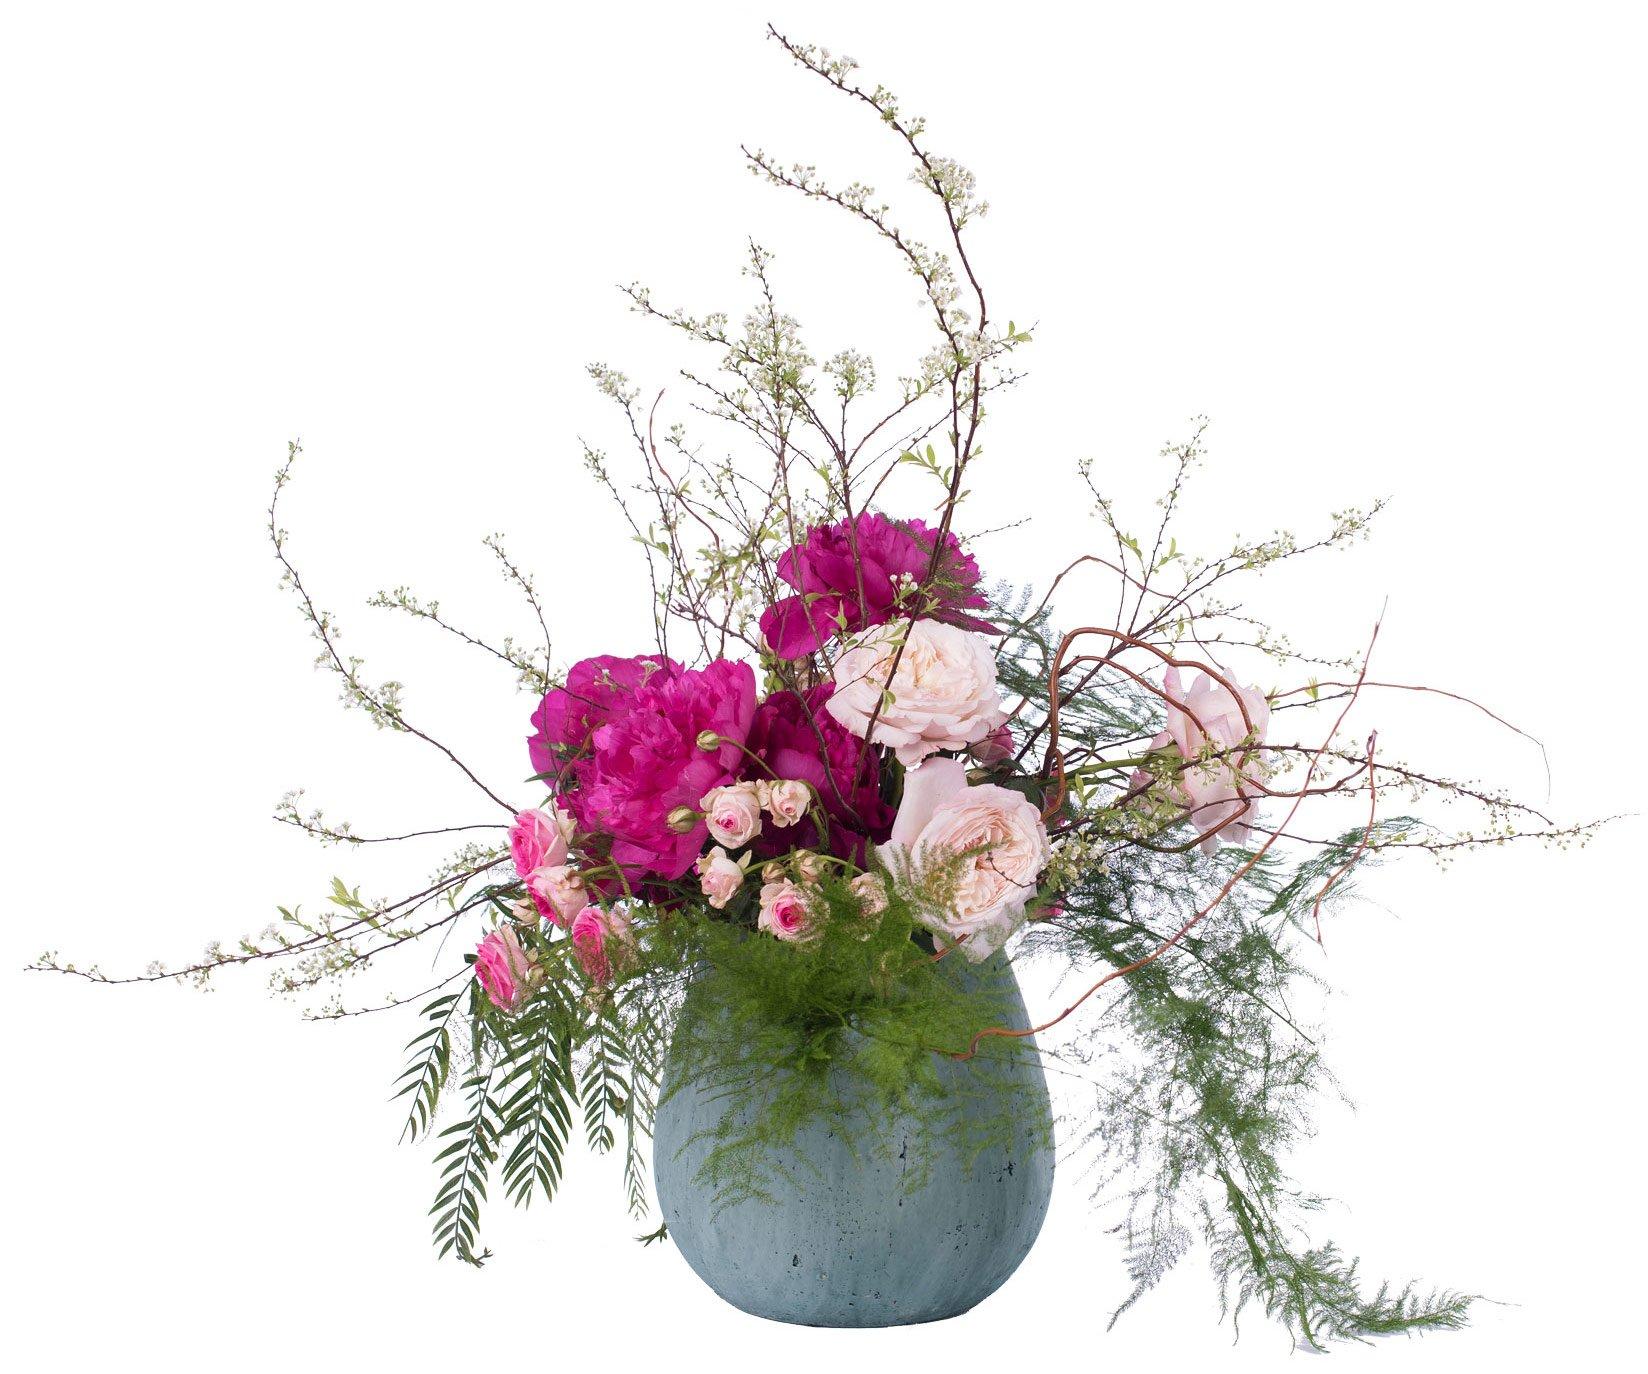 Bouquet Nº 01: Magnolia, Gerbera, Carnation, Astrantia, Foliage - Florist in Madrid